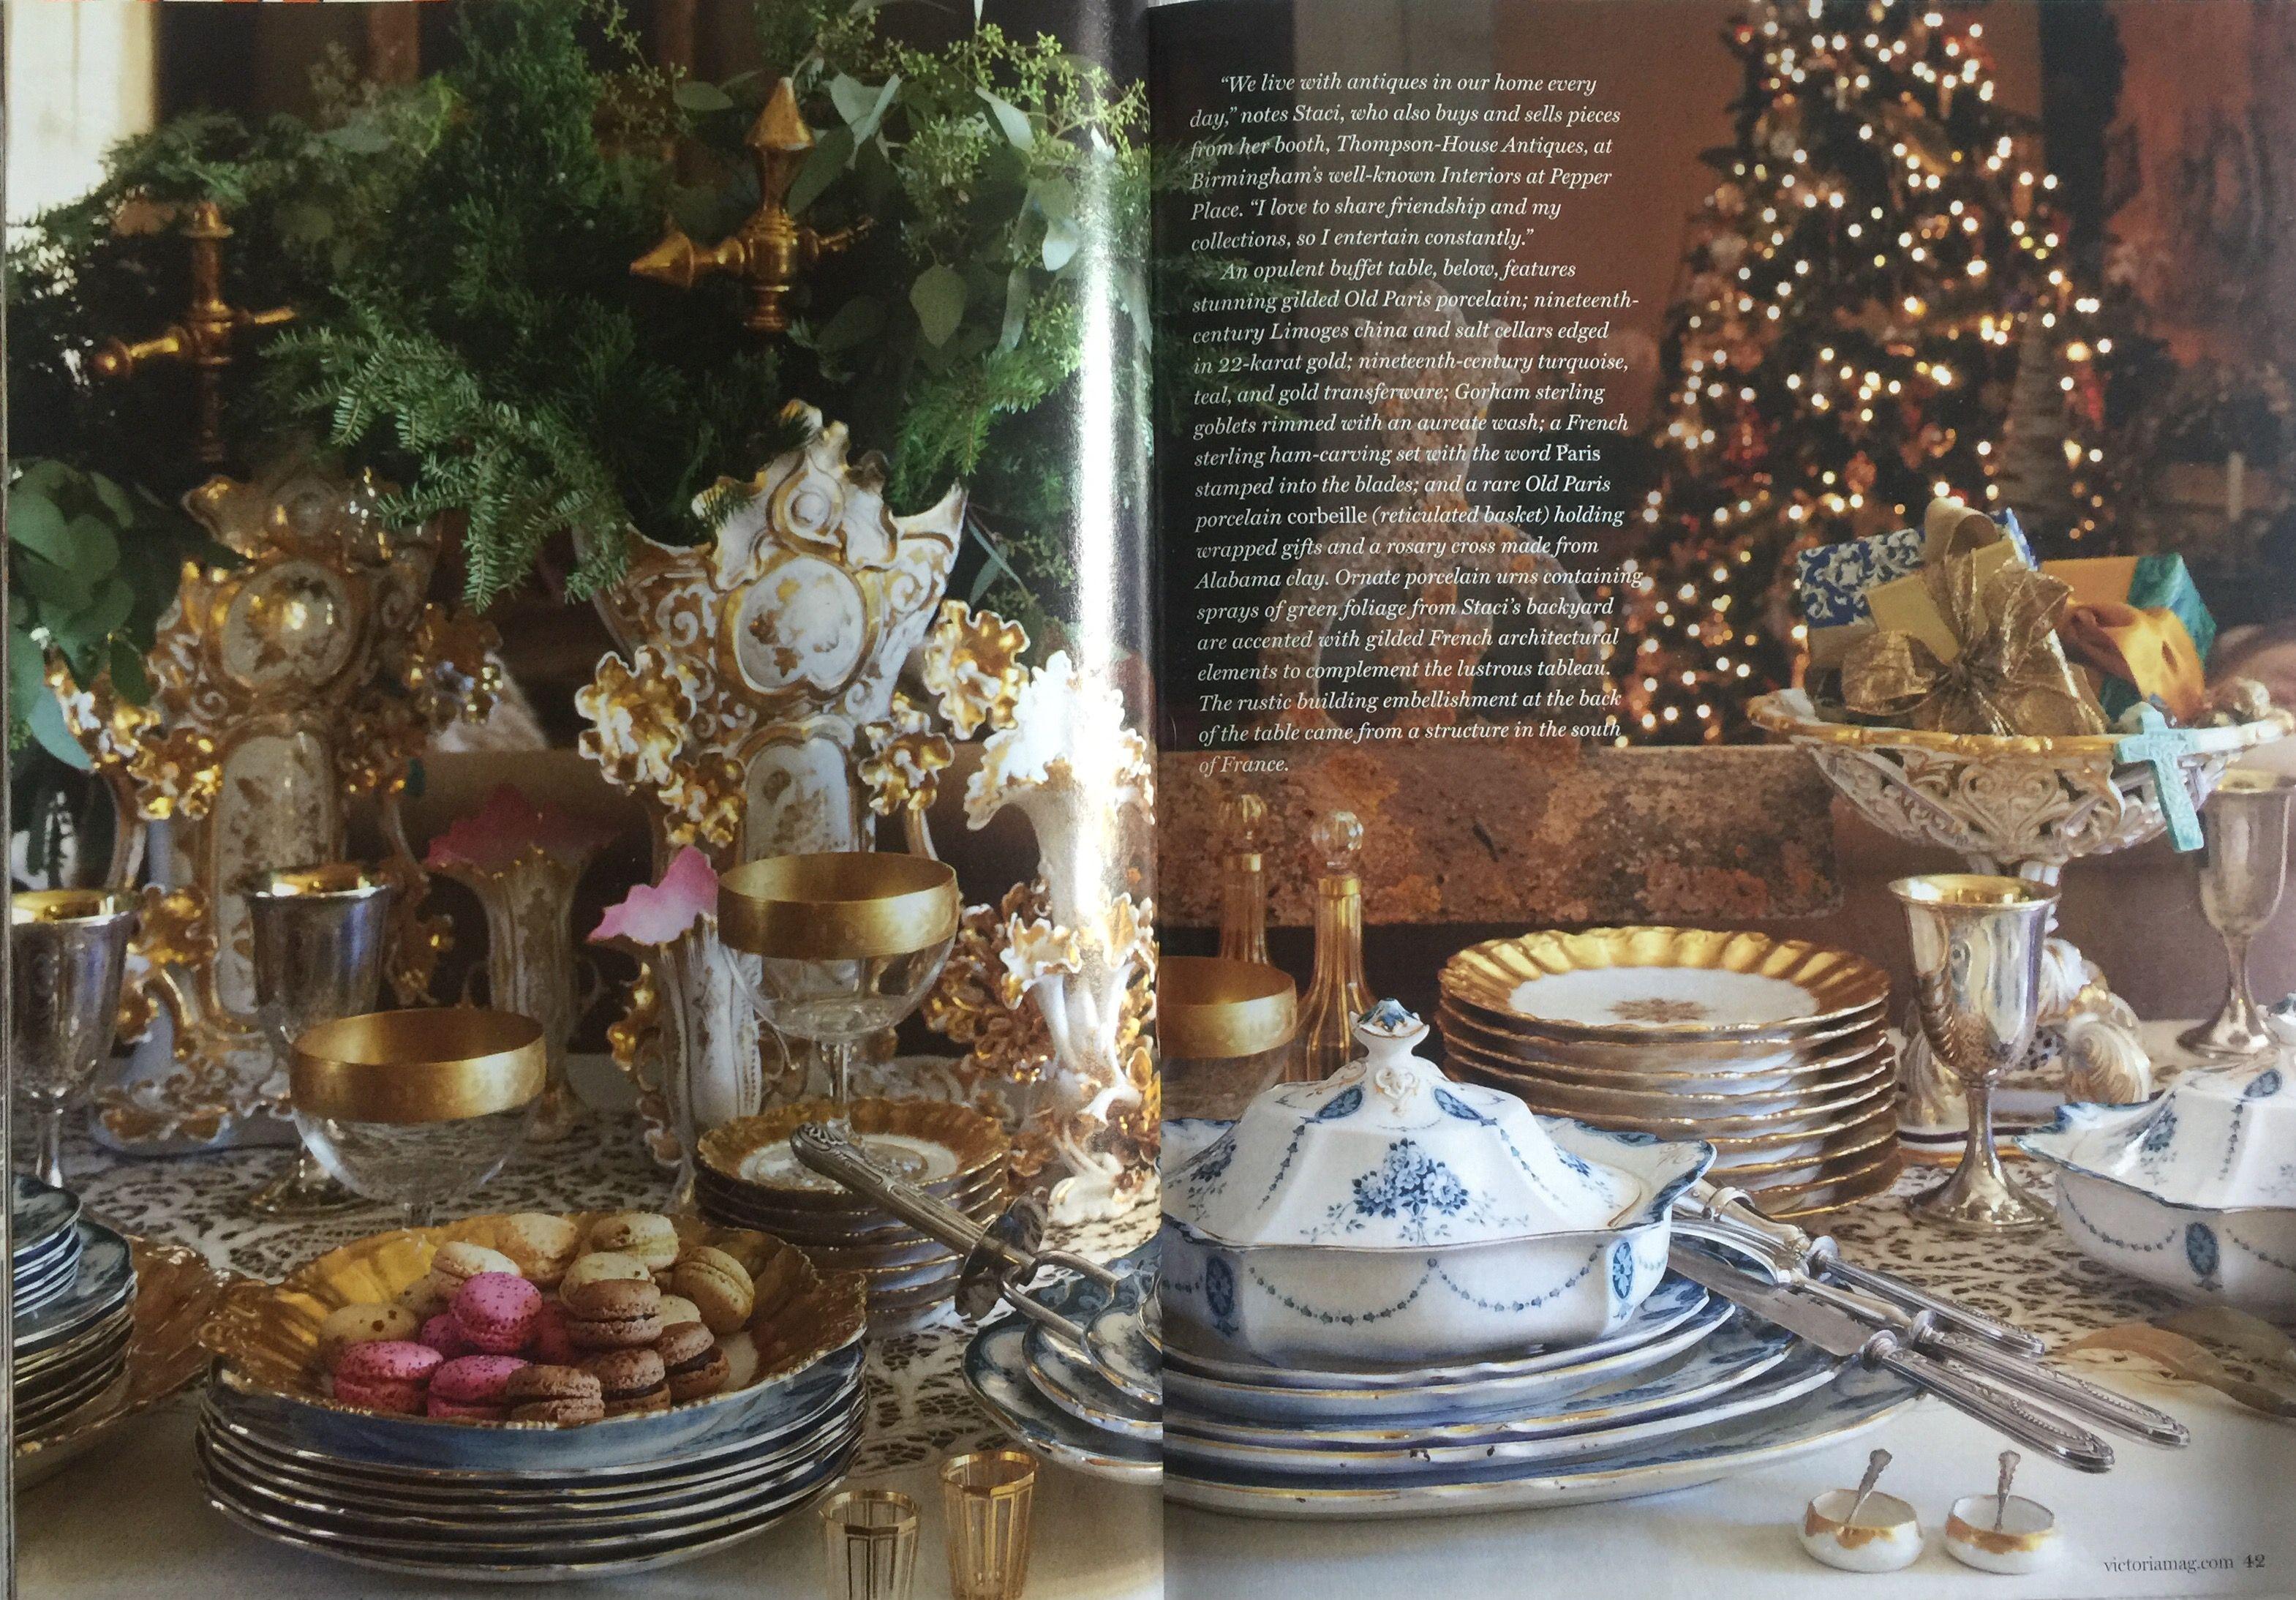 Christmas 2013, Victoria magazine.